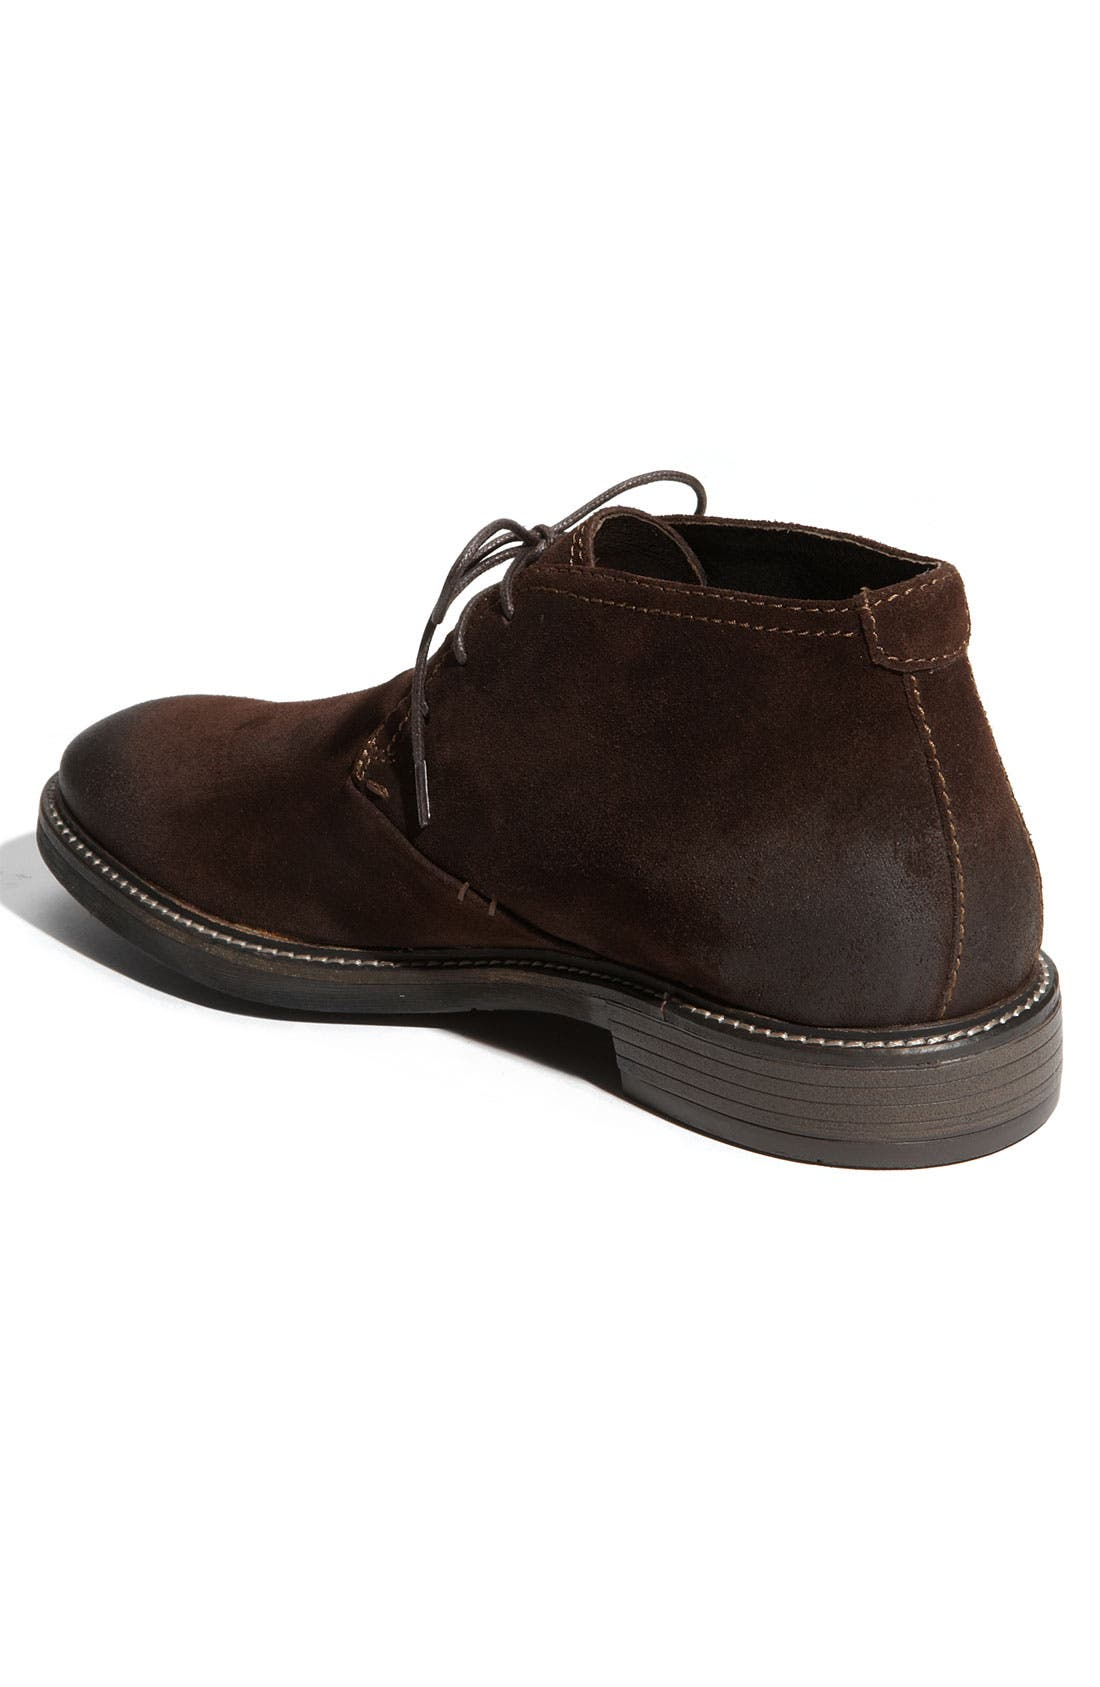 Alternate Image 2  - 1901 'Bates' Chukka Boot